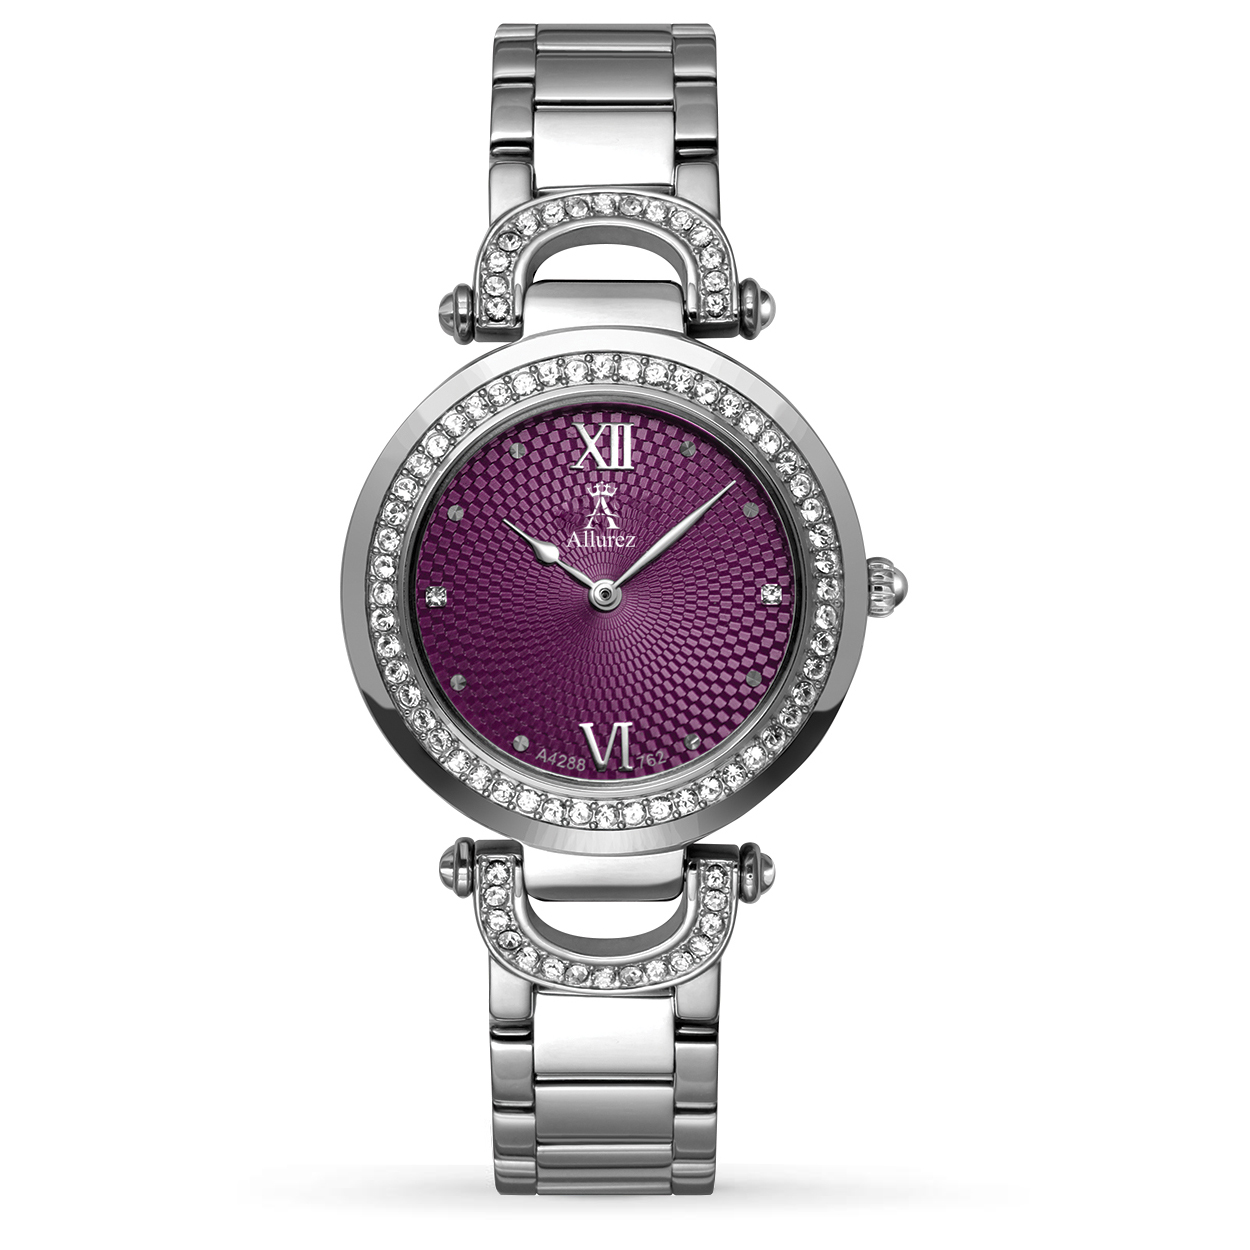 Allurez Women's Purple Dial Swarovski Crystal Stainless Steel Watch